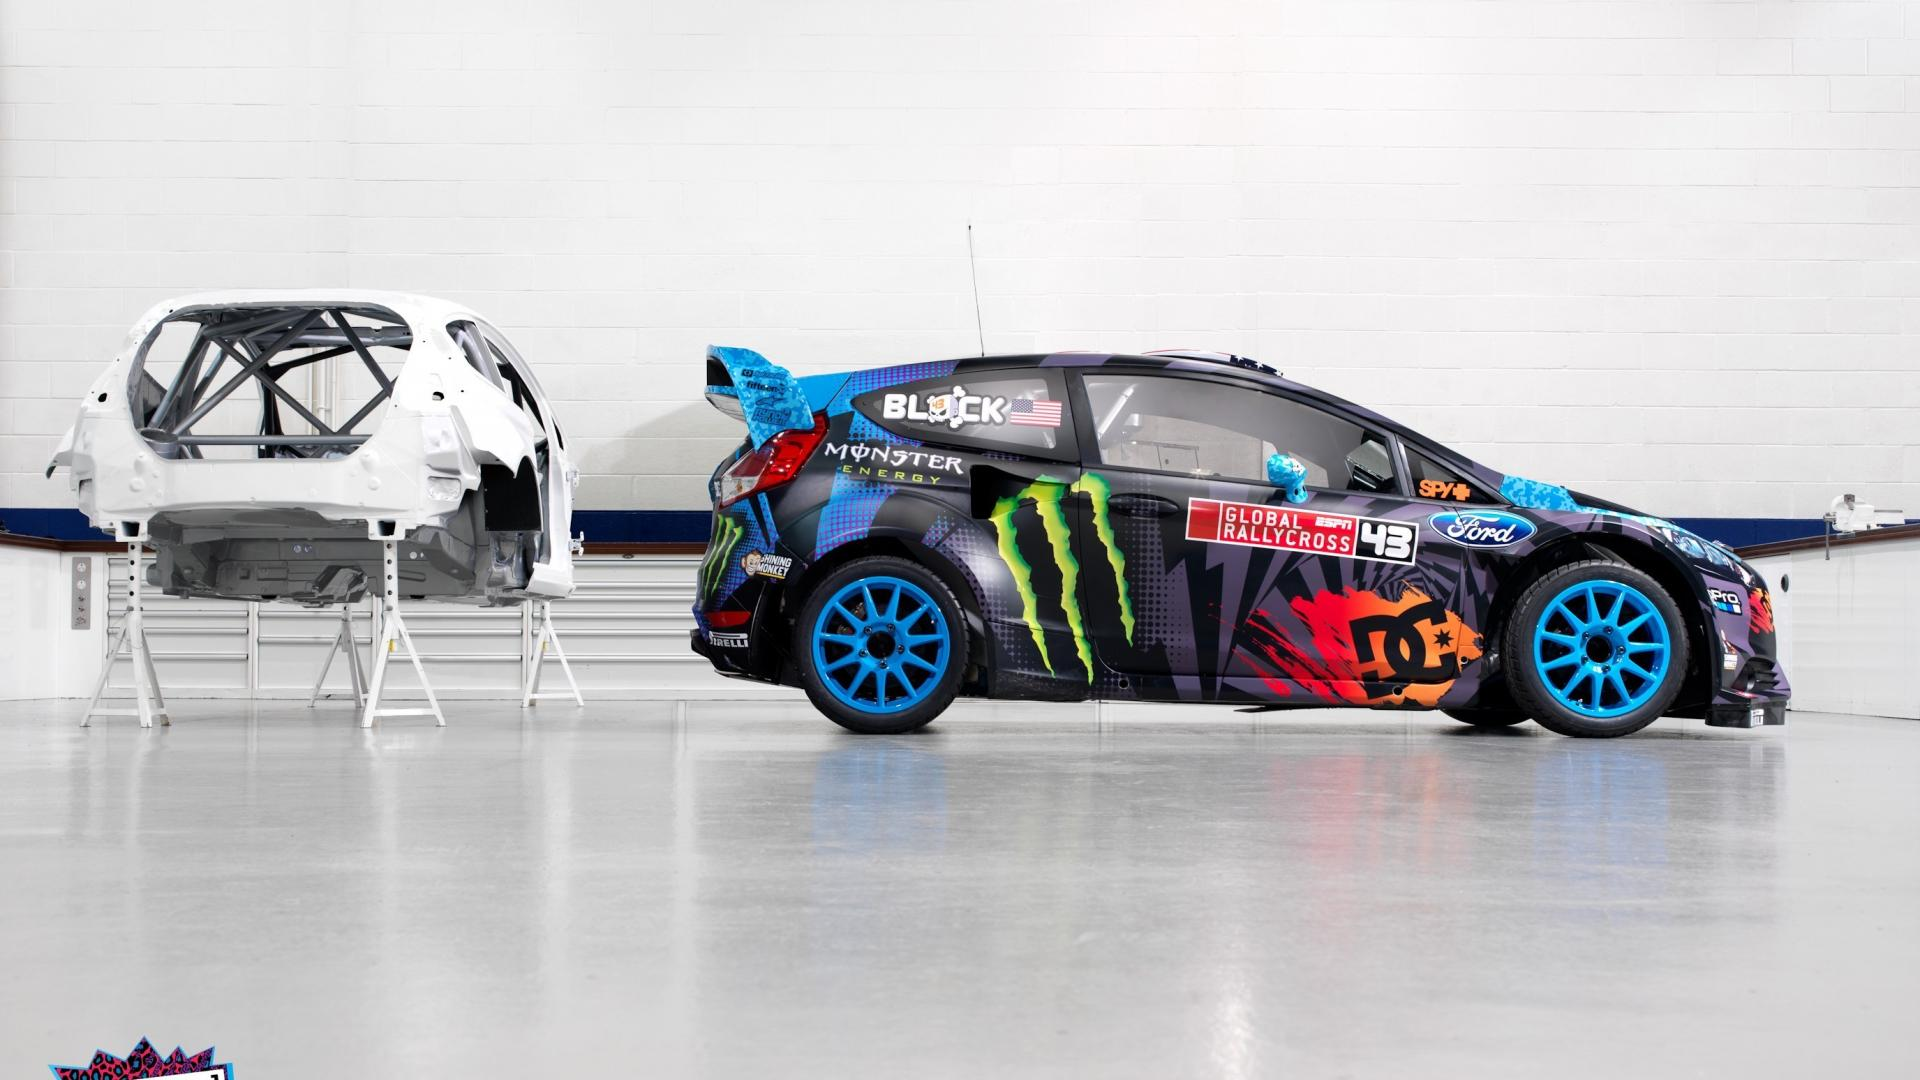 Go pro gopro pirelli racing cars hoonigan wallpaper 60021 1920x1080